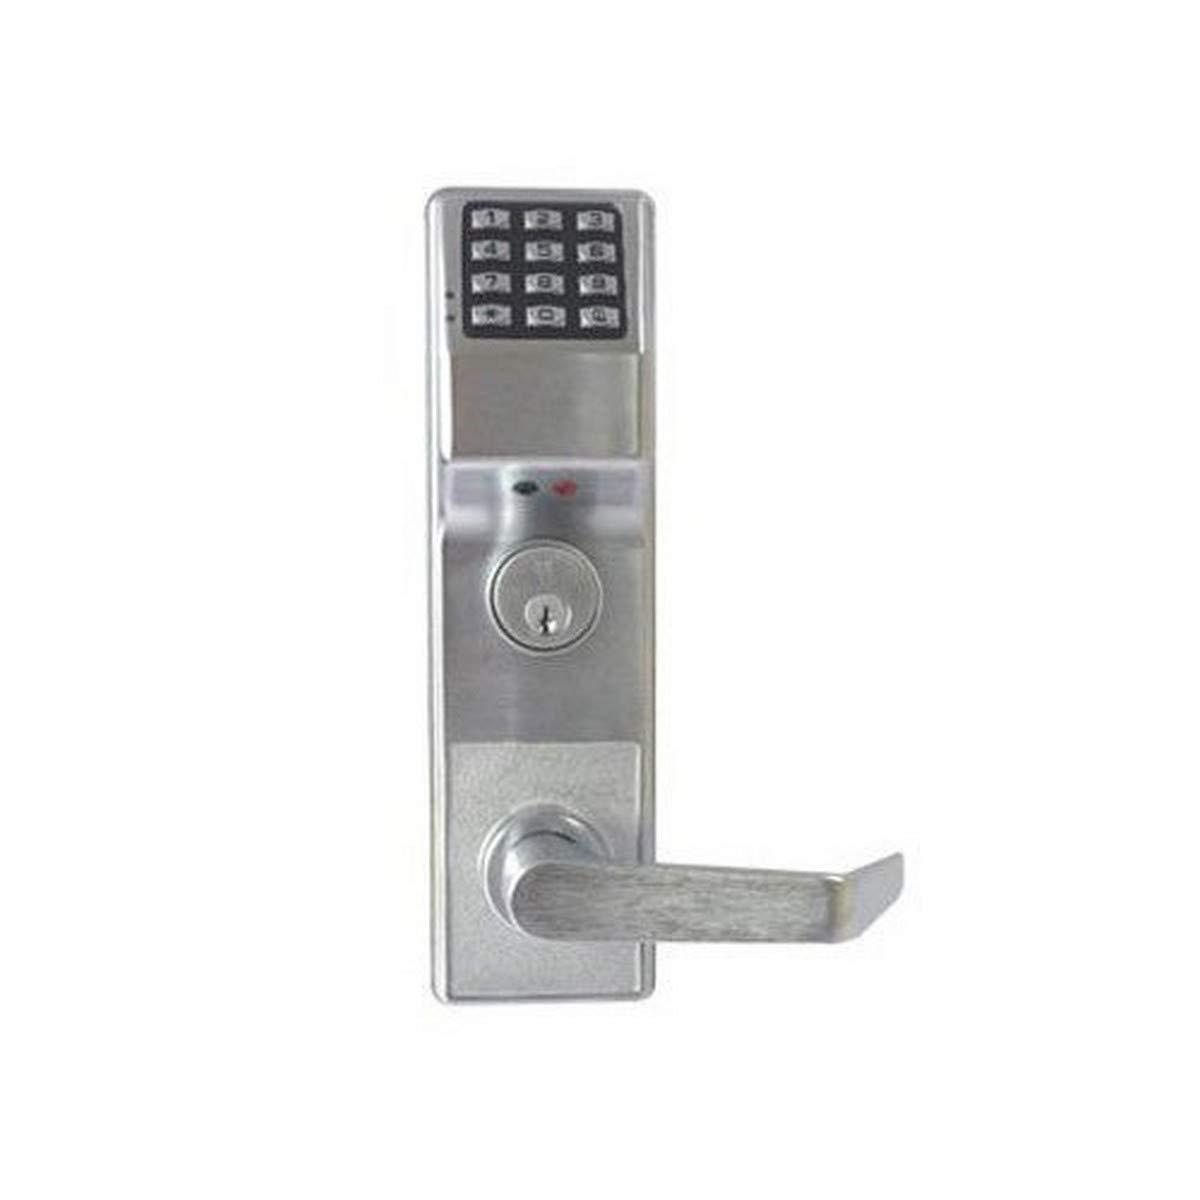 Alarm Lock Systems Inc. ETDLS1G 26DV99 Trilogy T3 Exit Trim V99 26D, Satin Chrome